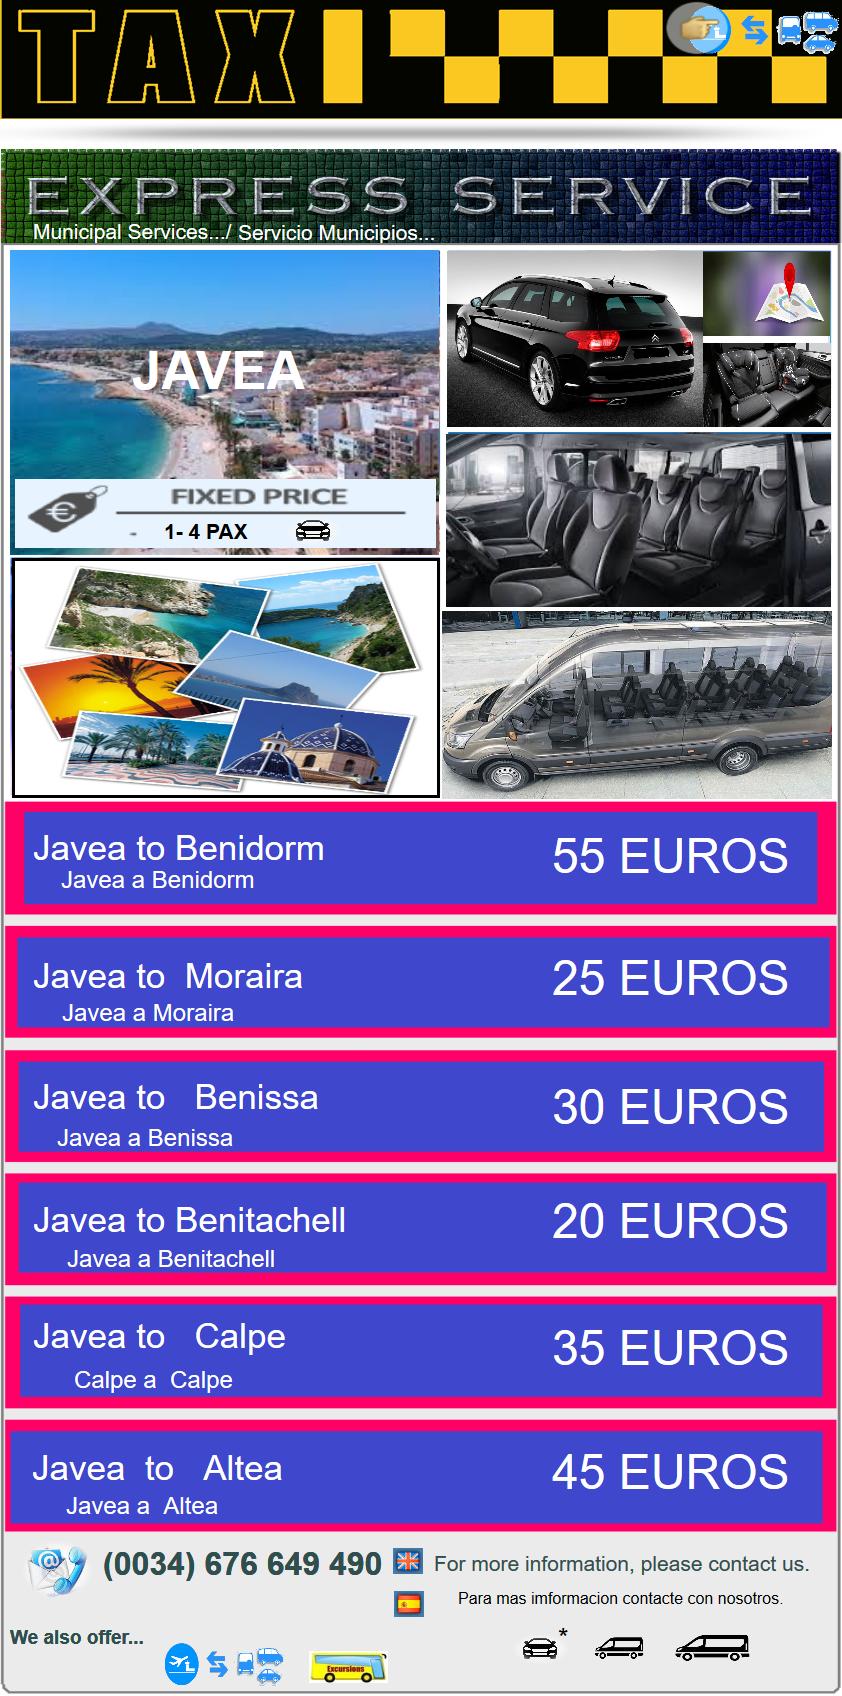 EXPRESS SERVICE Javea  EXPRESS SERVICE